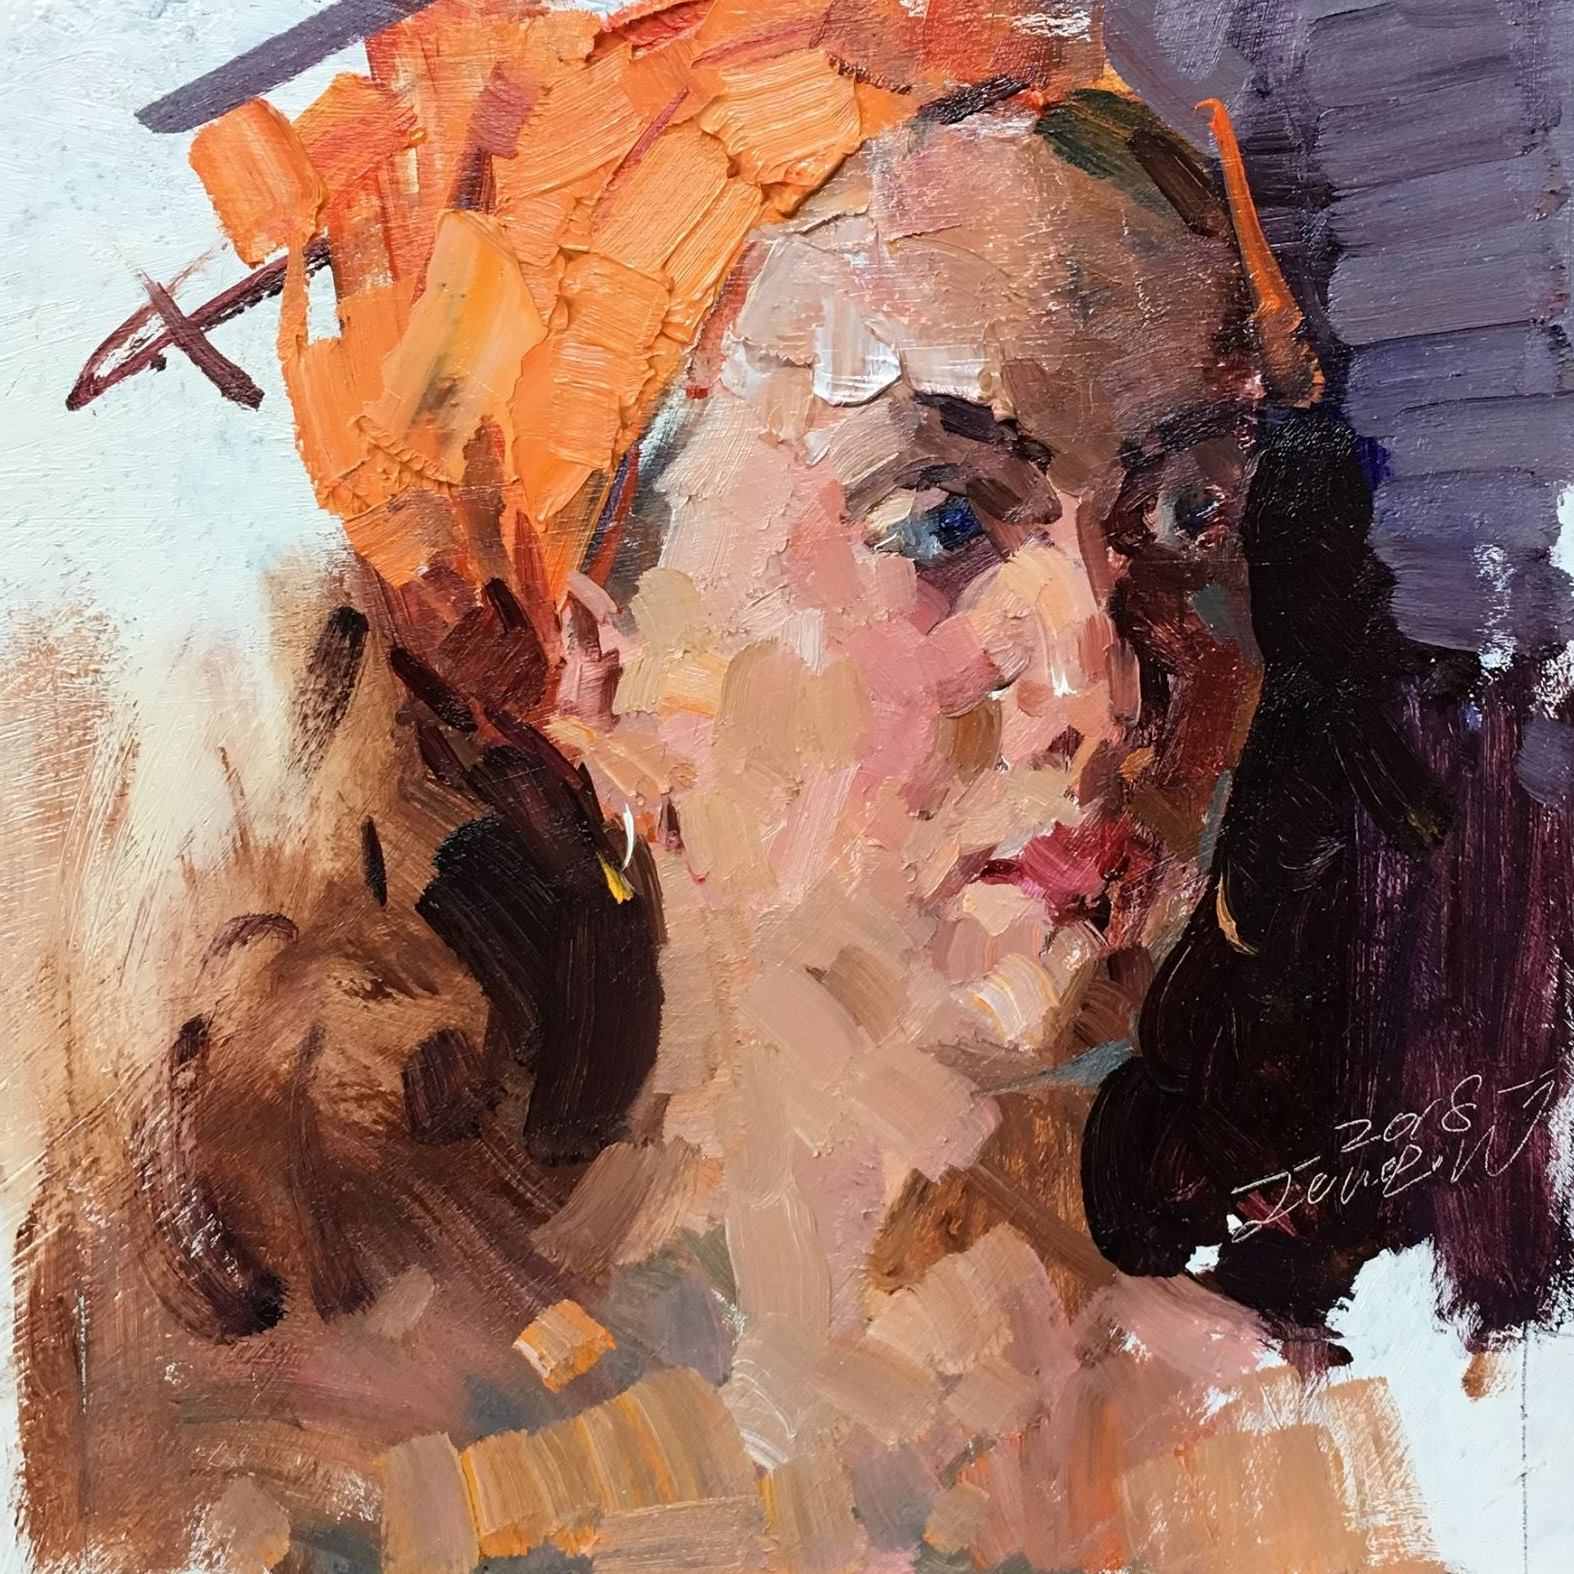 Painting Demo by Jove Wang (2018)